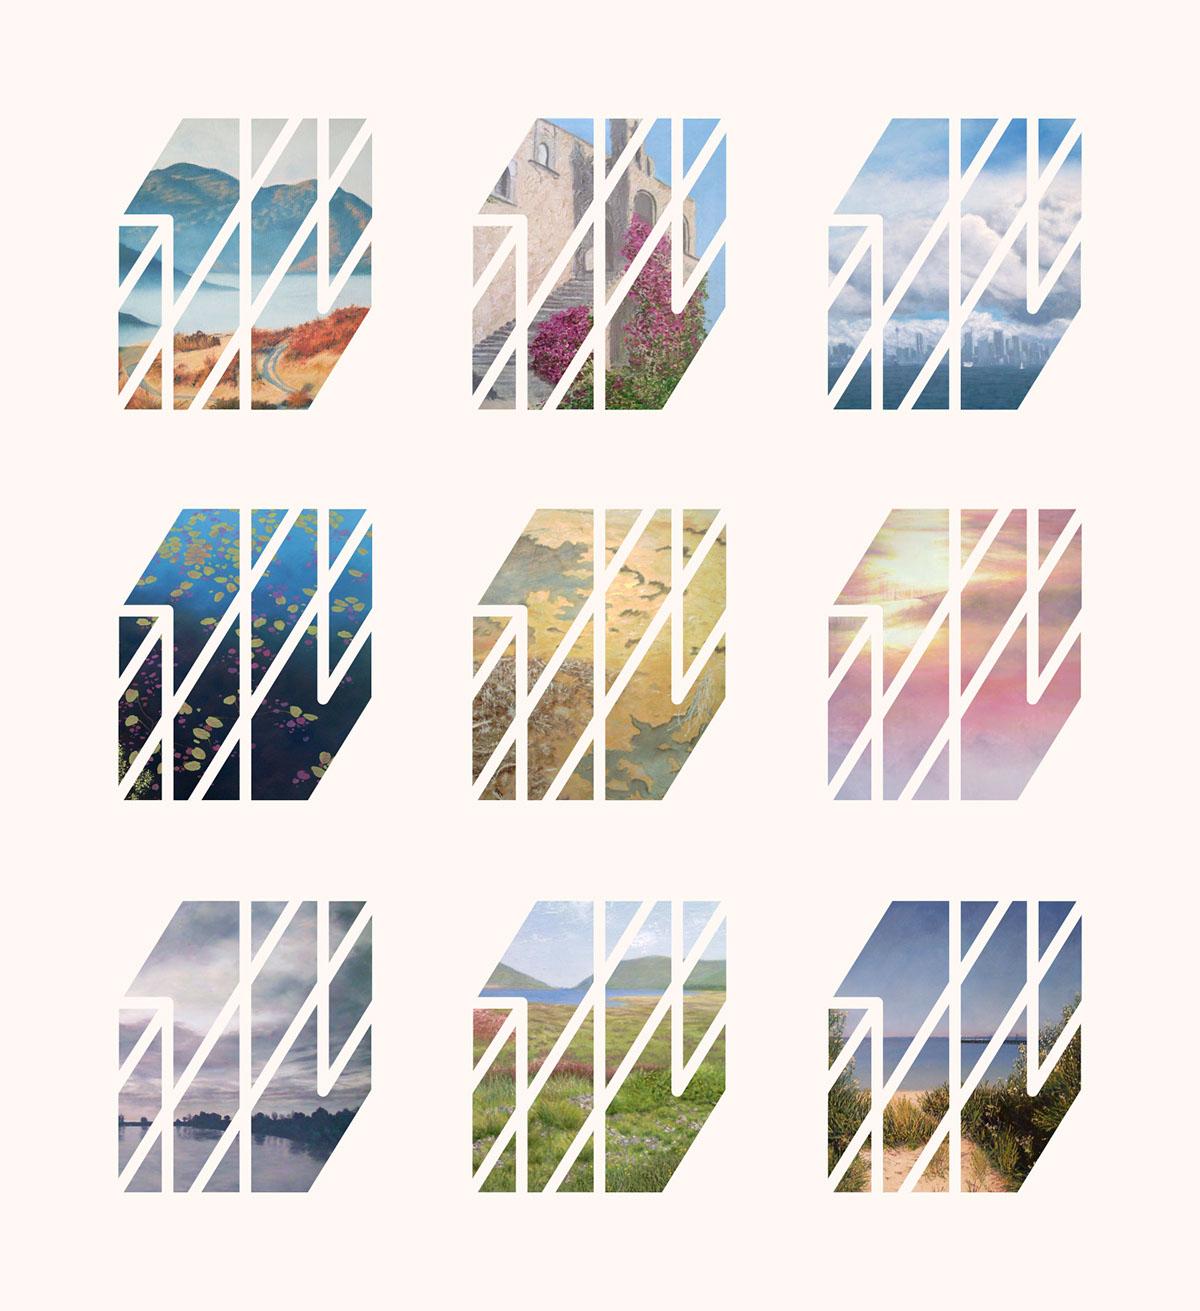 logo artist Website visual identity pattern mobile Business Cards